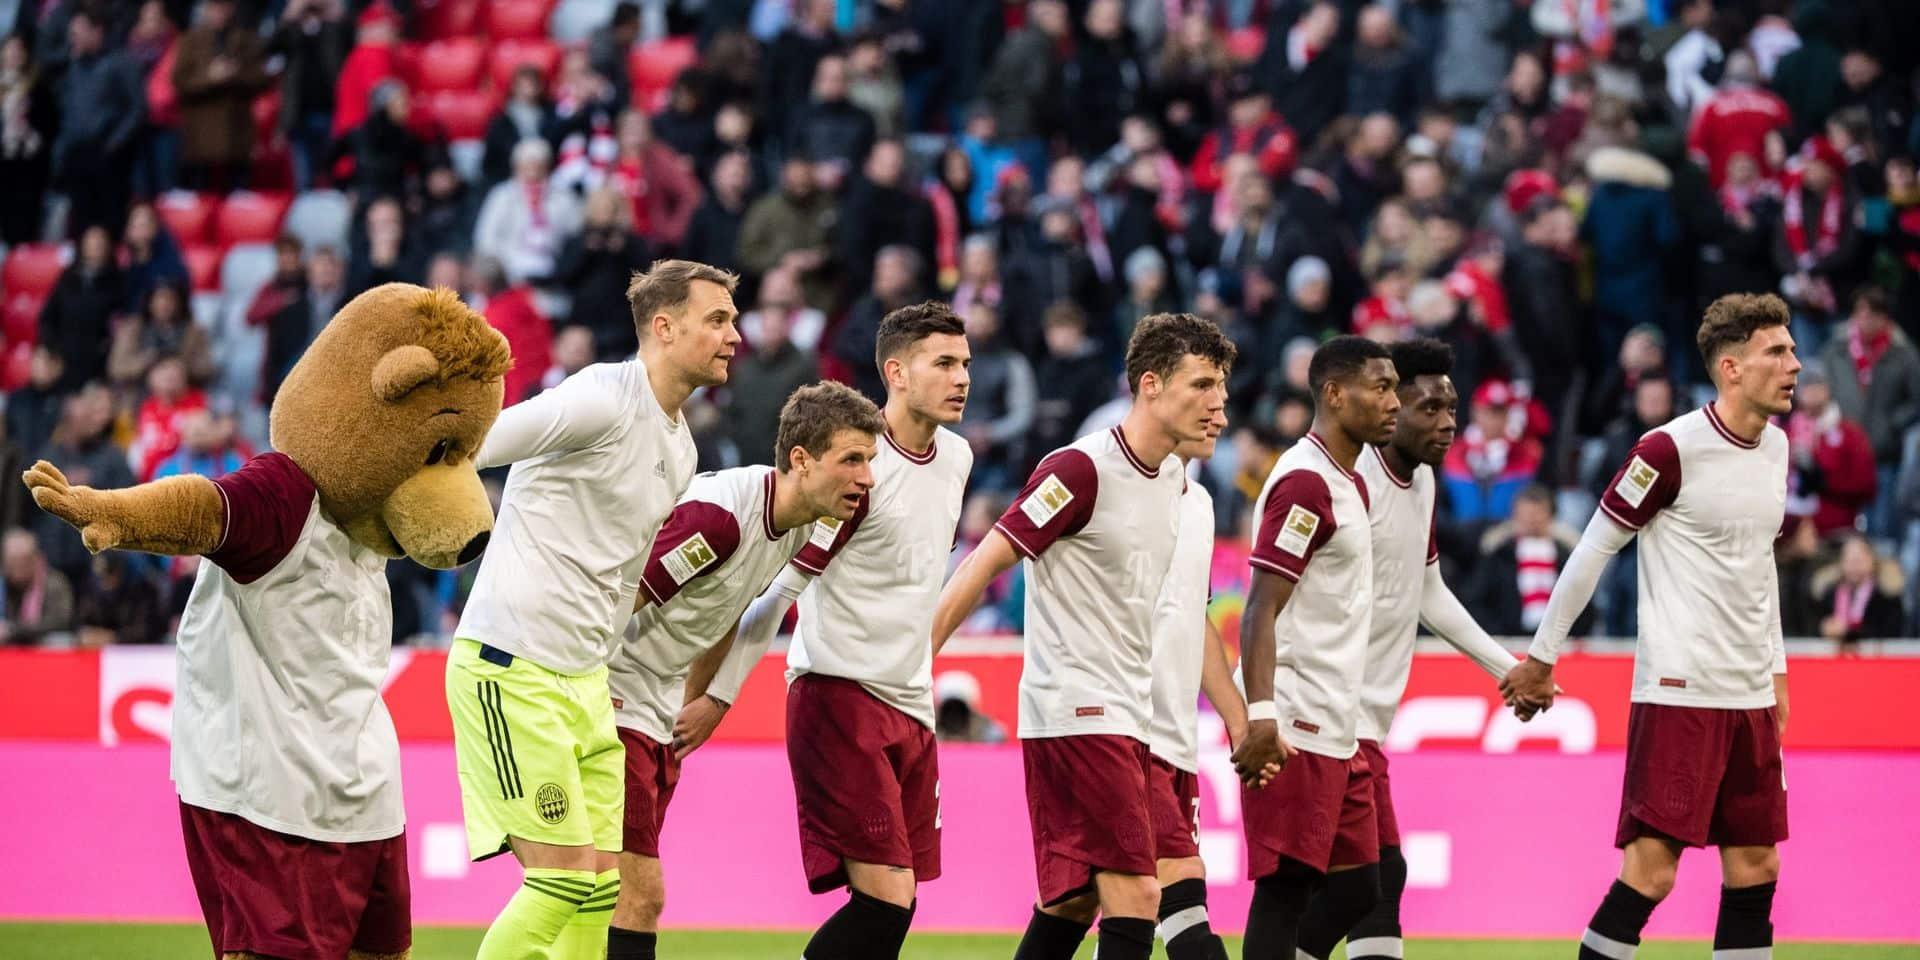 Le Bayern conforte son avance, le virus menace la Bundesliga